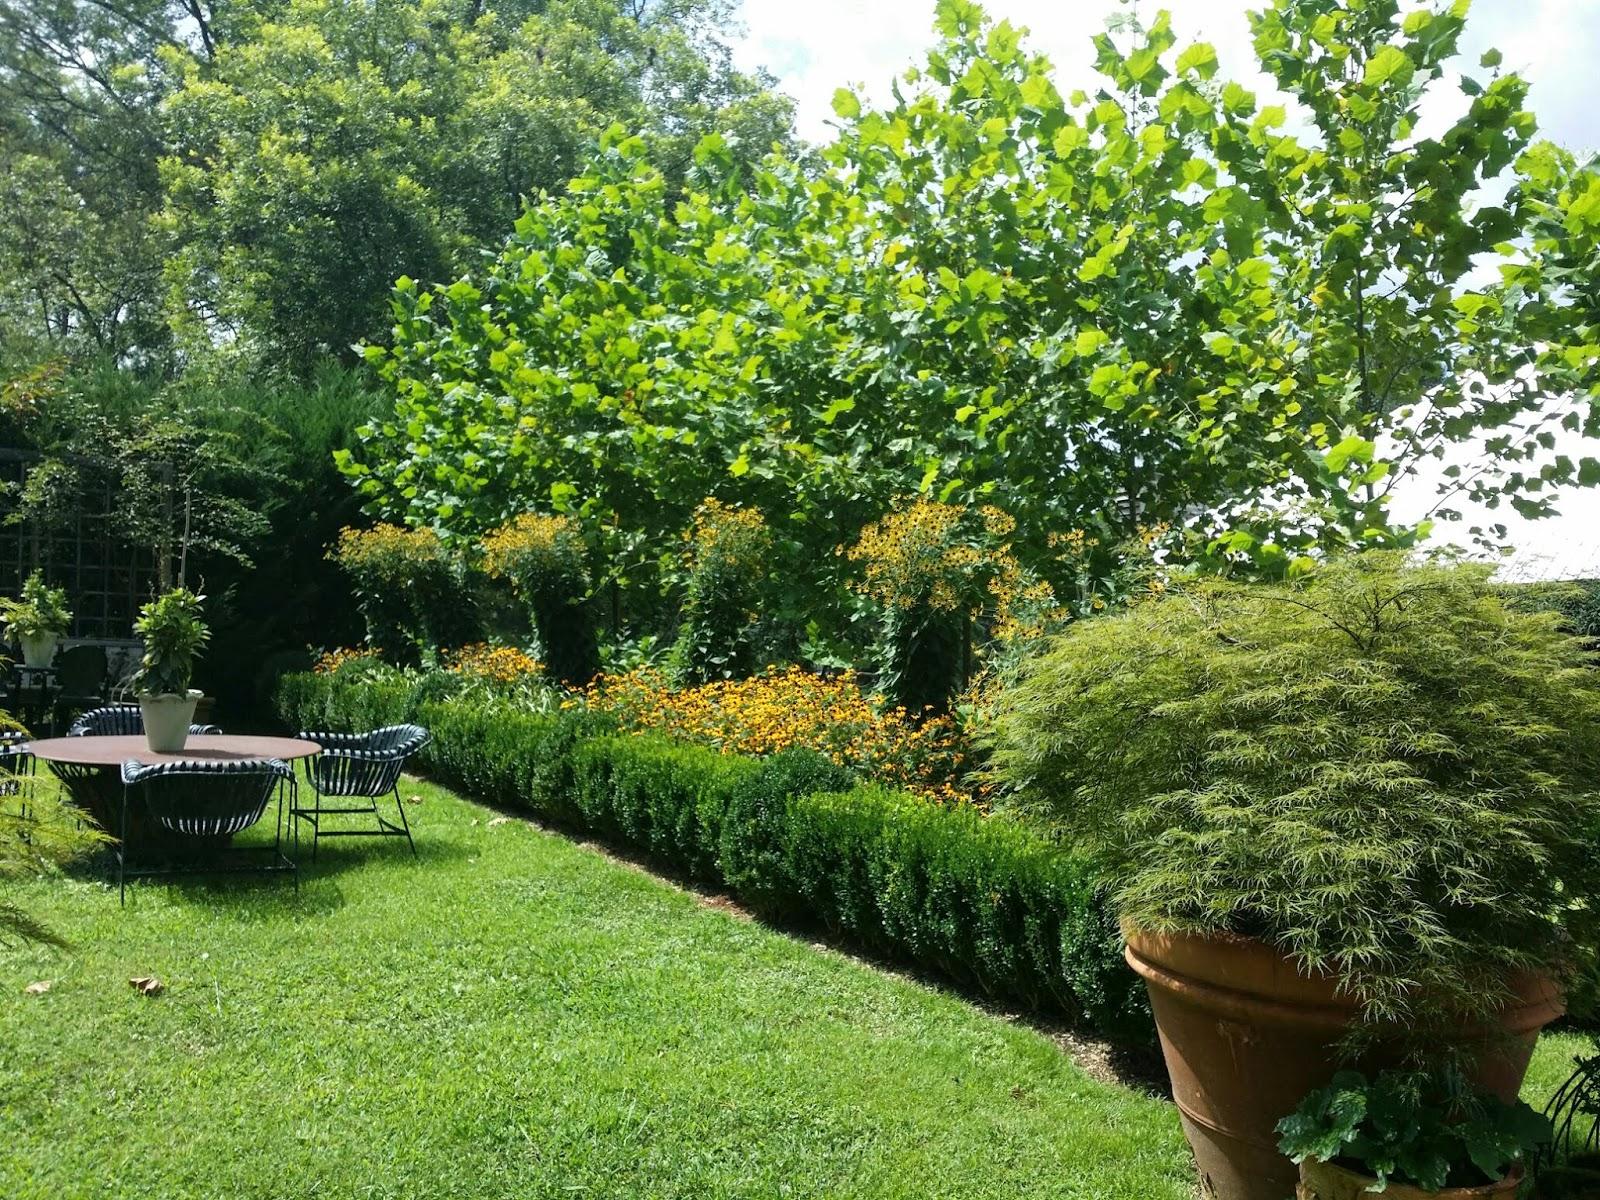 Tara dillard the best garden design ideas - The best garden design ...